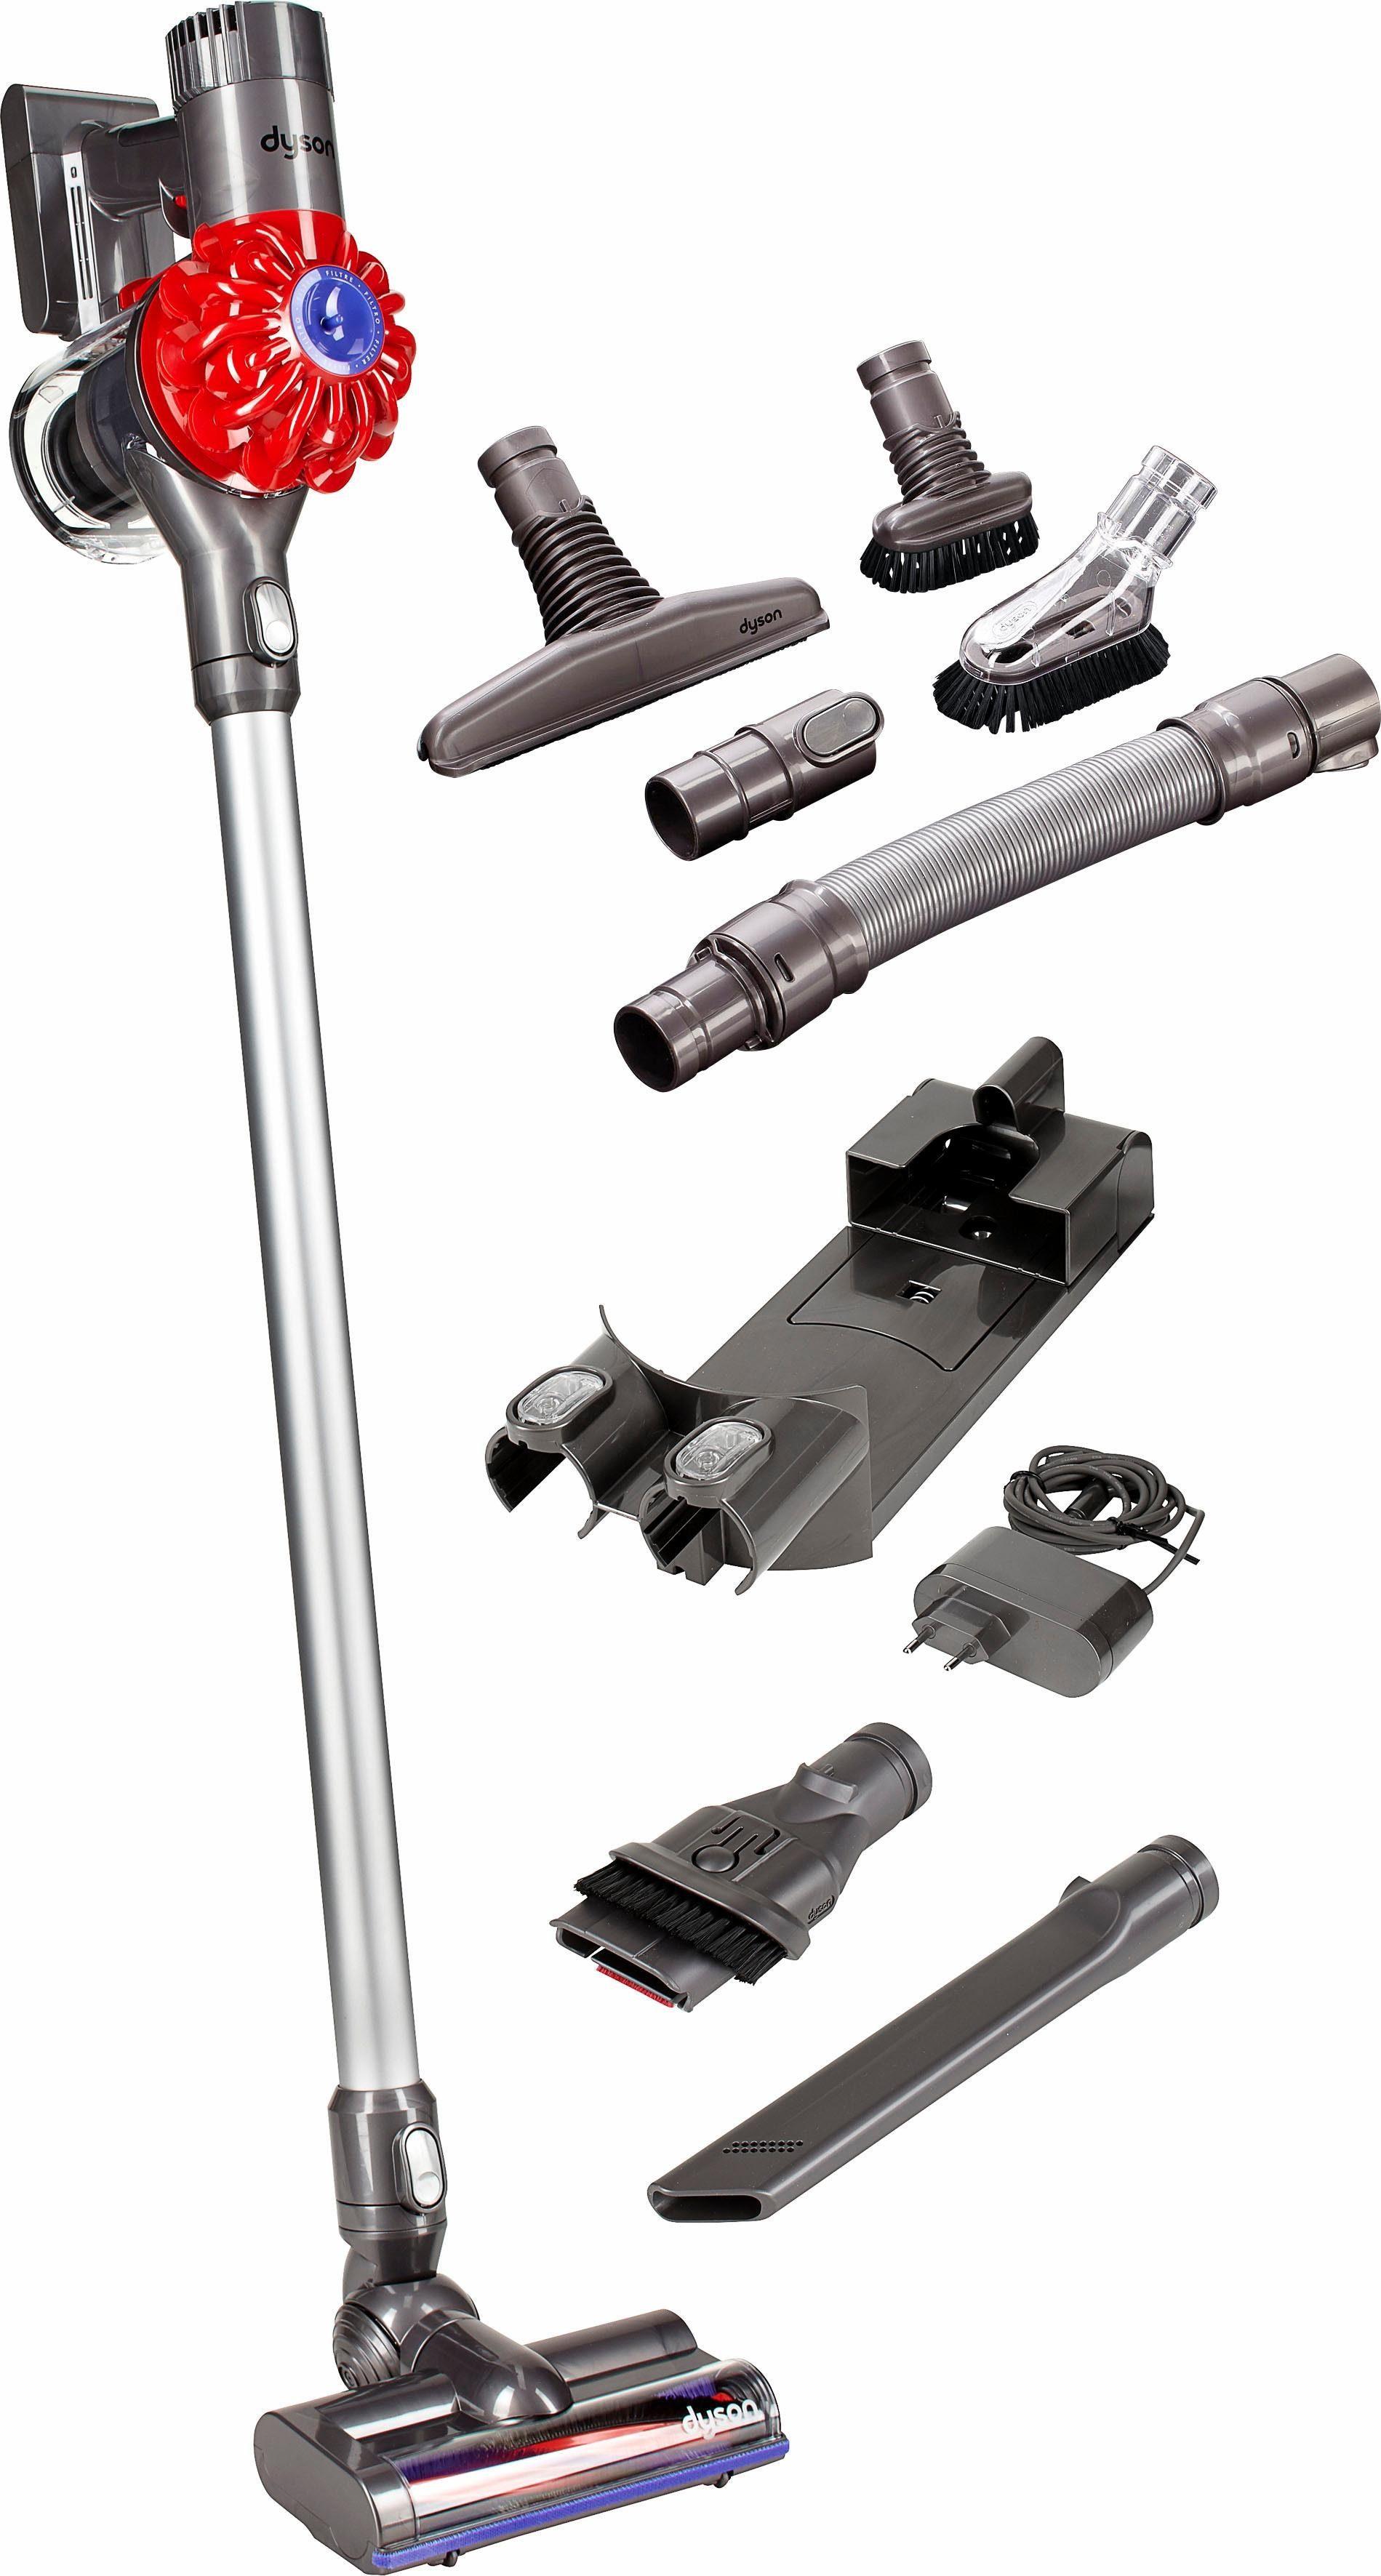 Dyson Akkusauger DC62 Full Kit (DC62 + Akkusauger-Set), beutellos, iron-rot